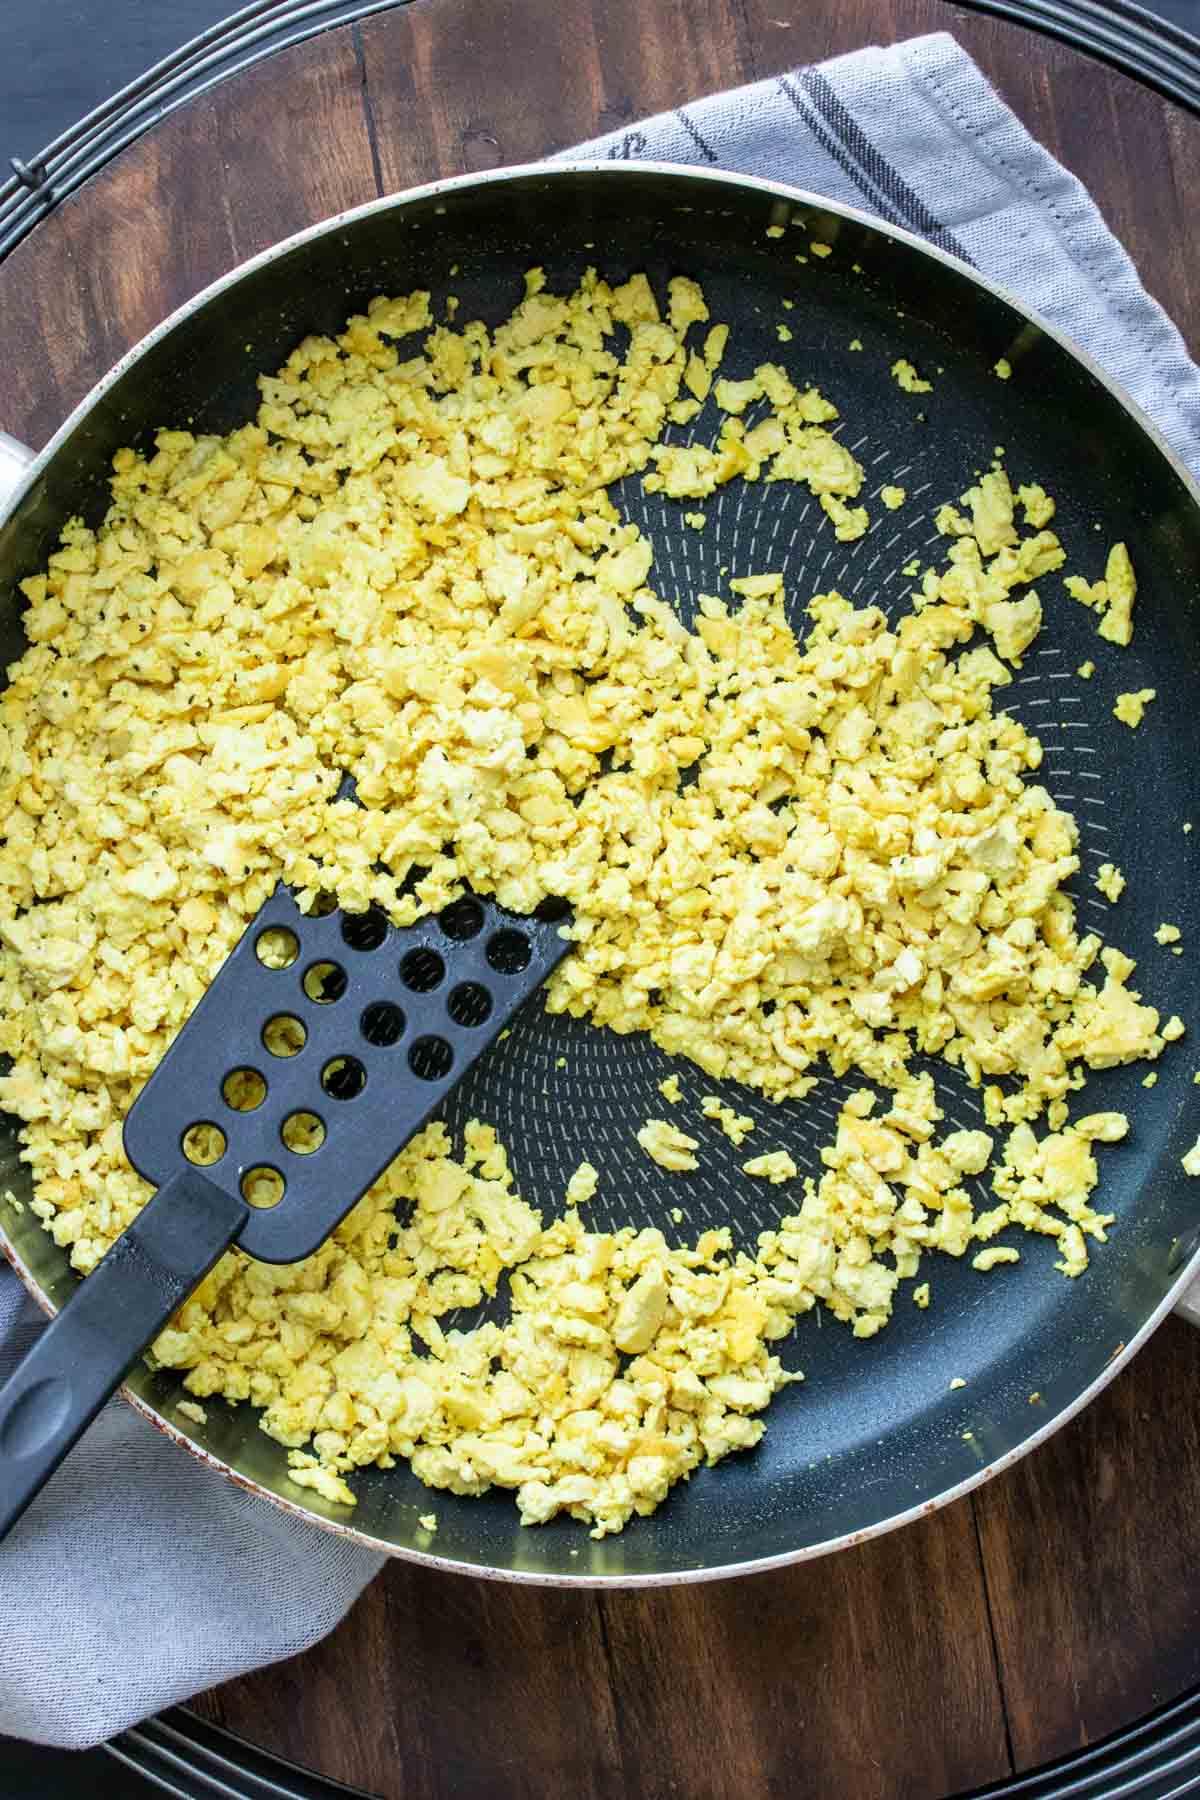 Spatula cooking yellow crumbled tofu in a pan